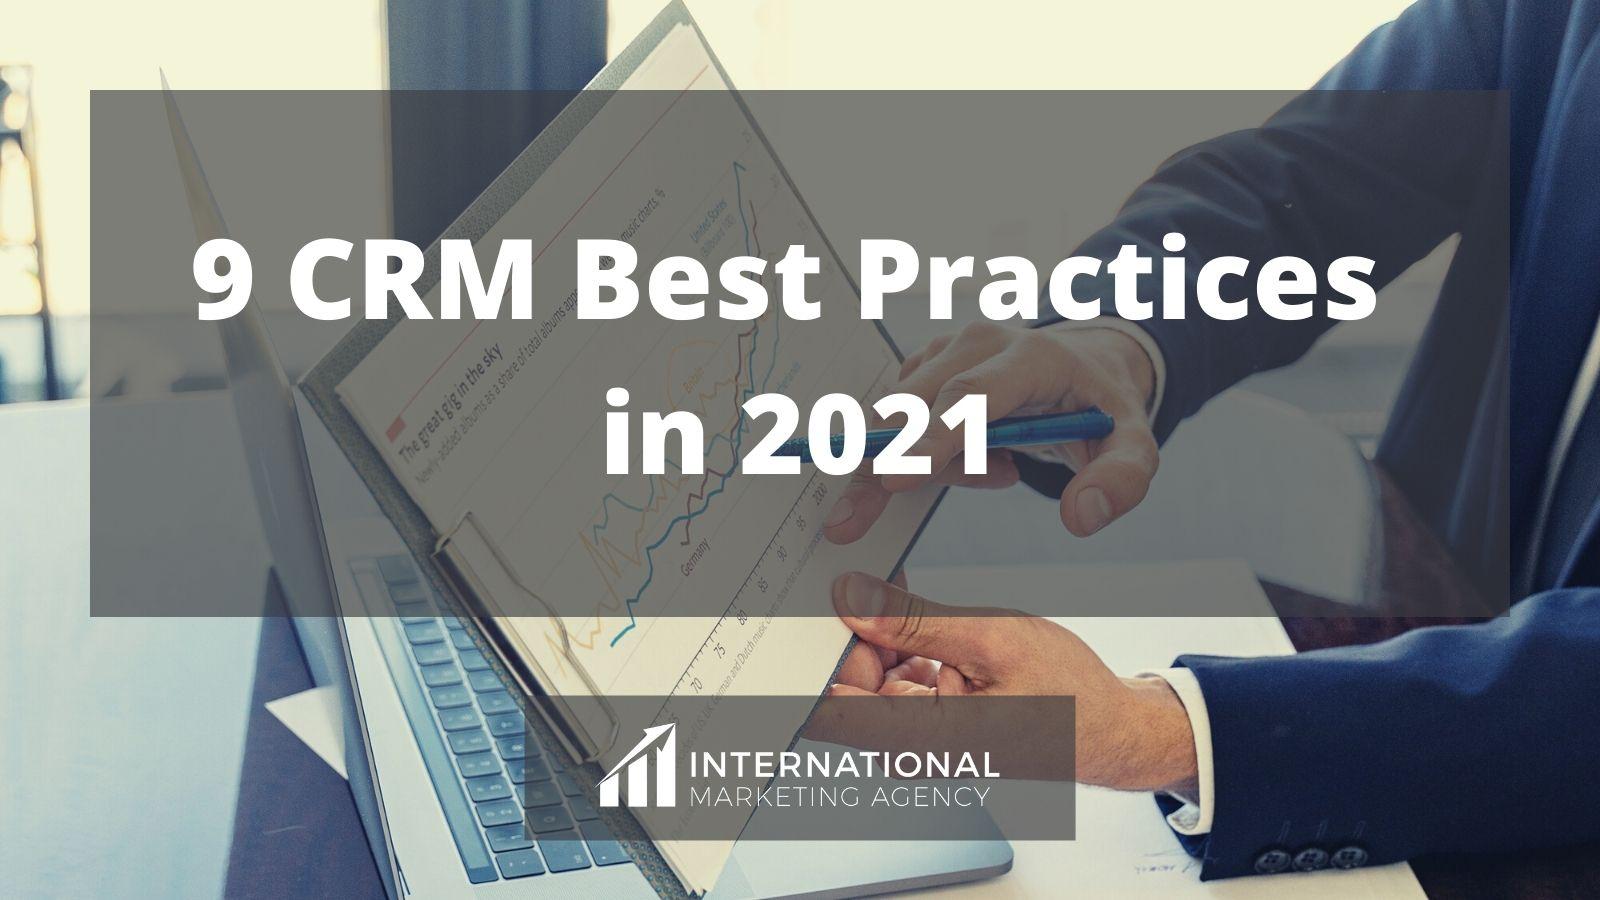 9 CRM Best Practices in 2021